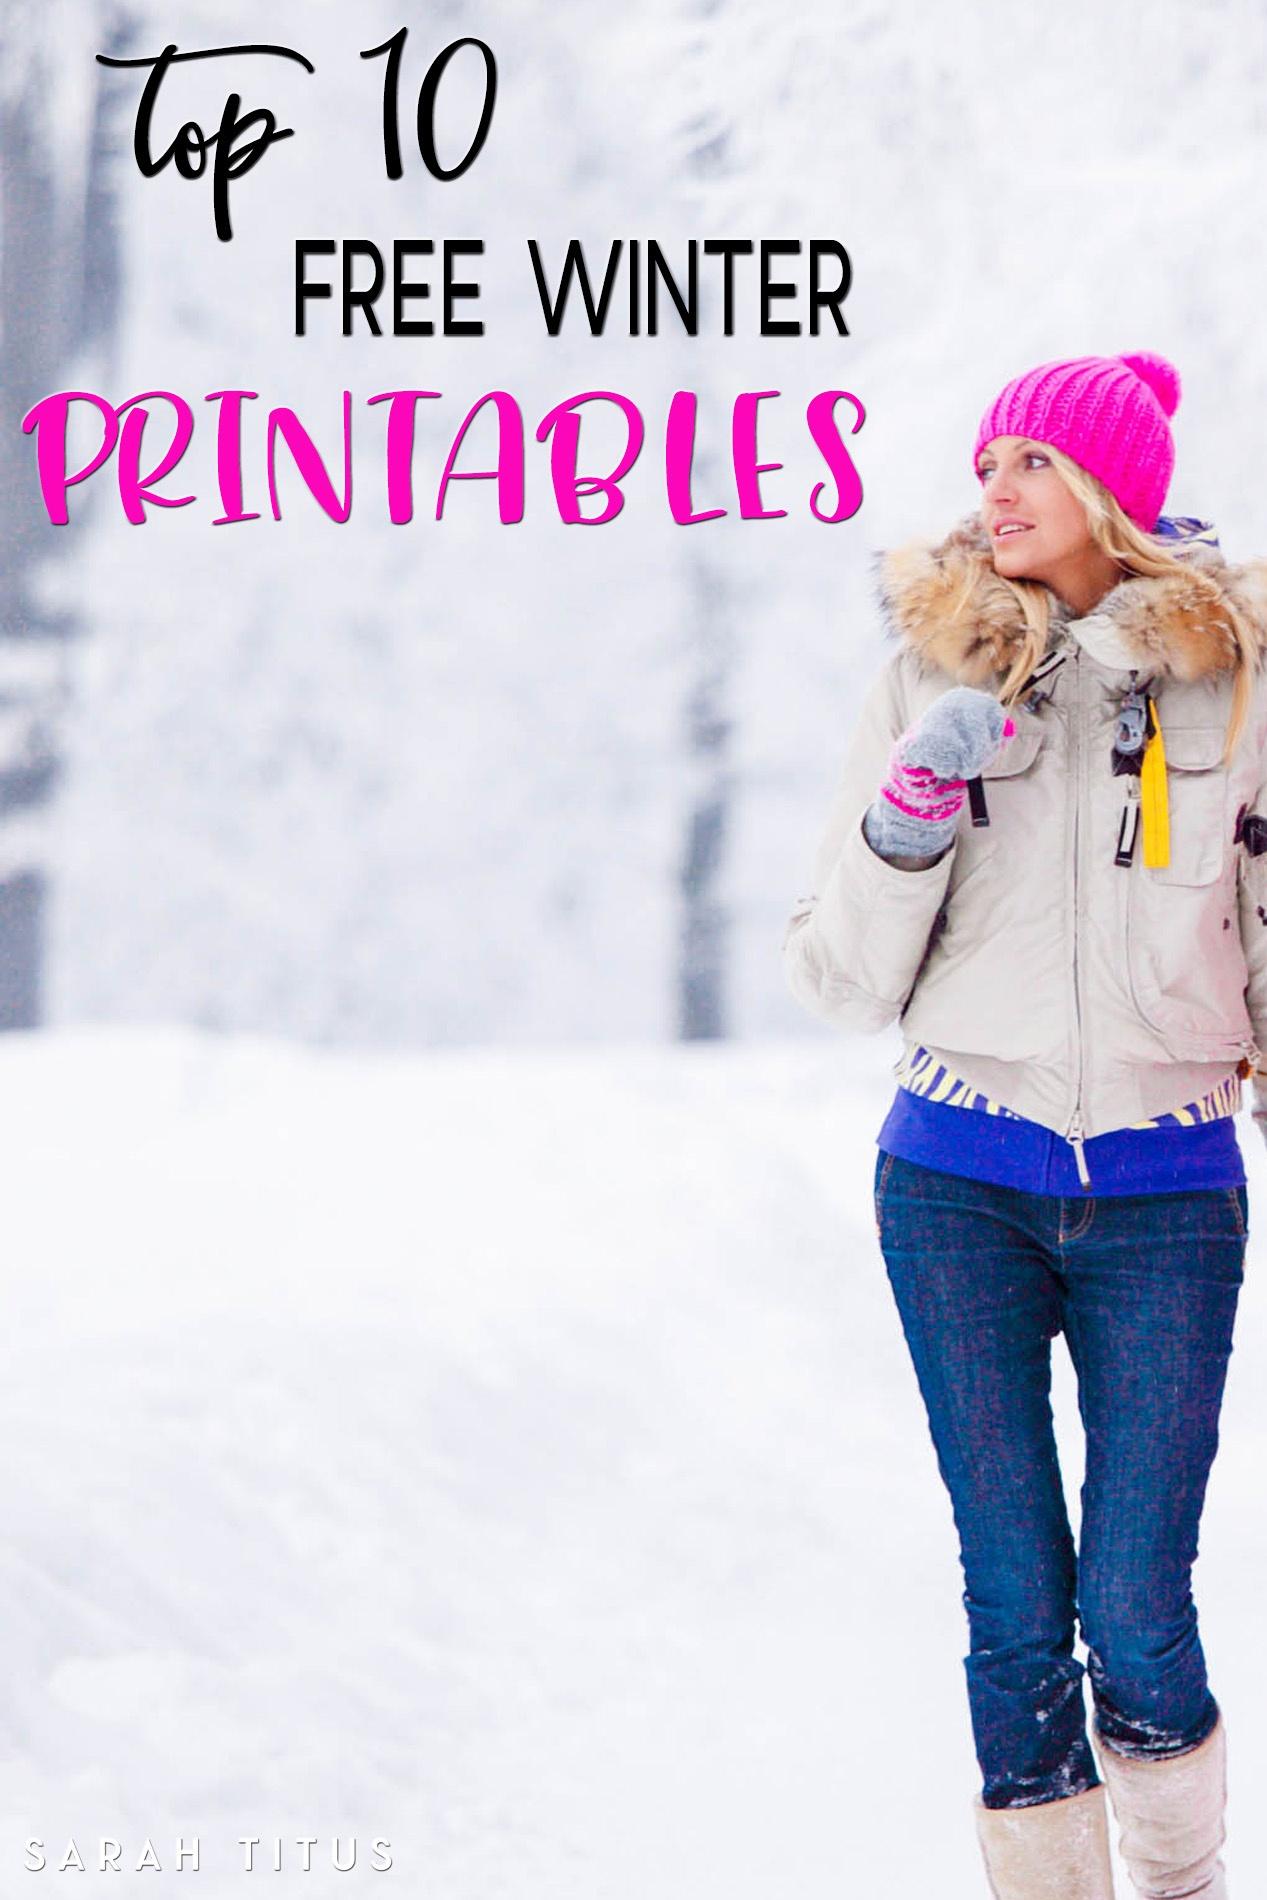 Top 10 Free Winter Printables - Sarah Titus - Free Printable Winterization Stickers